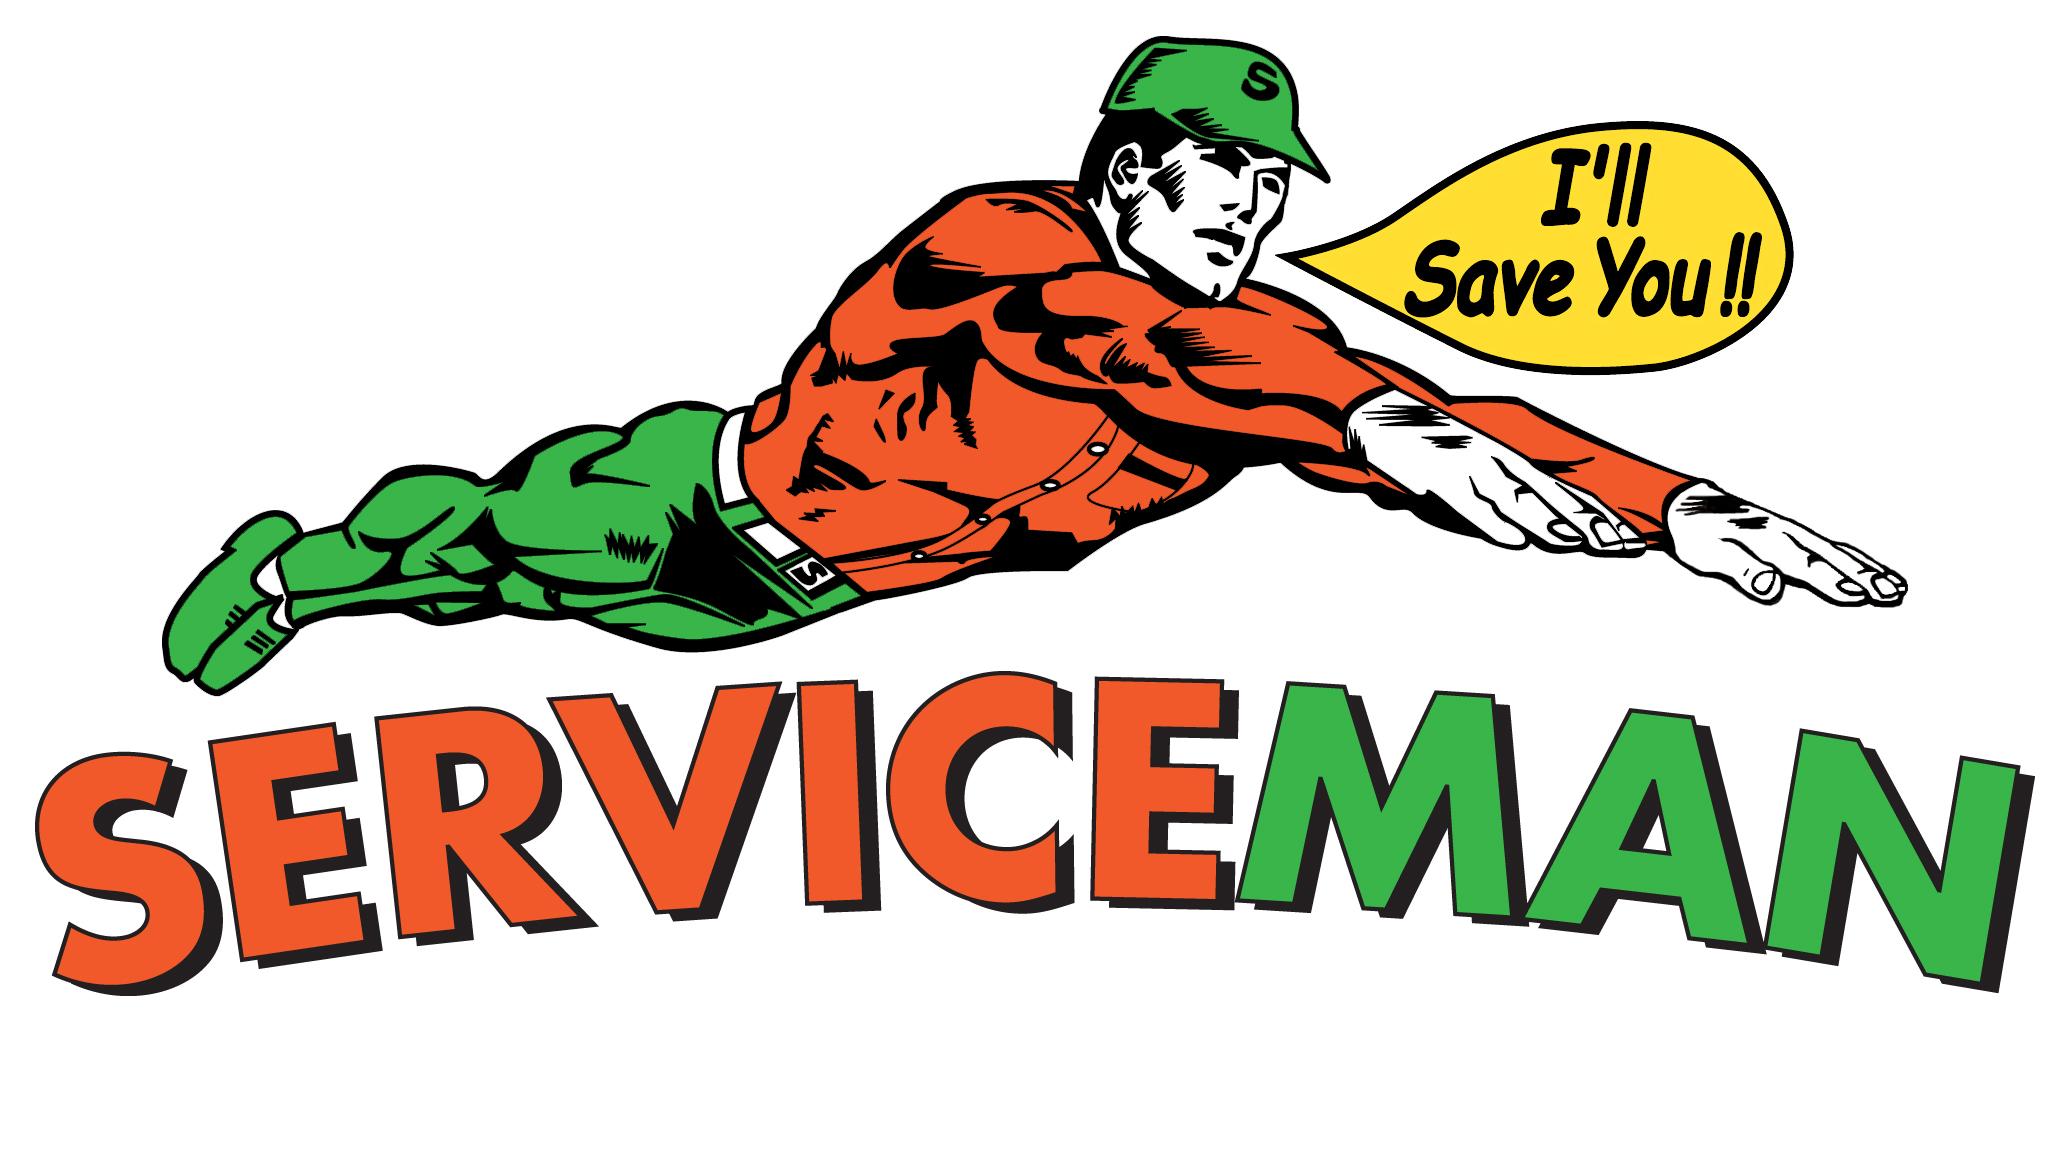 Serviceman_logo_png.png